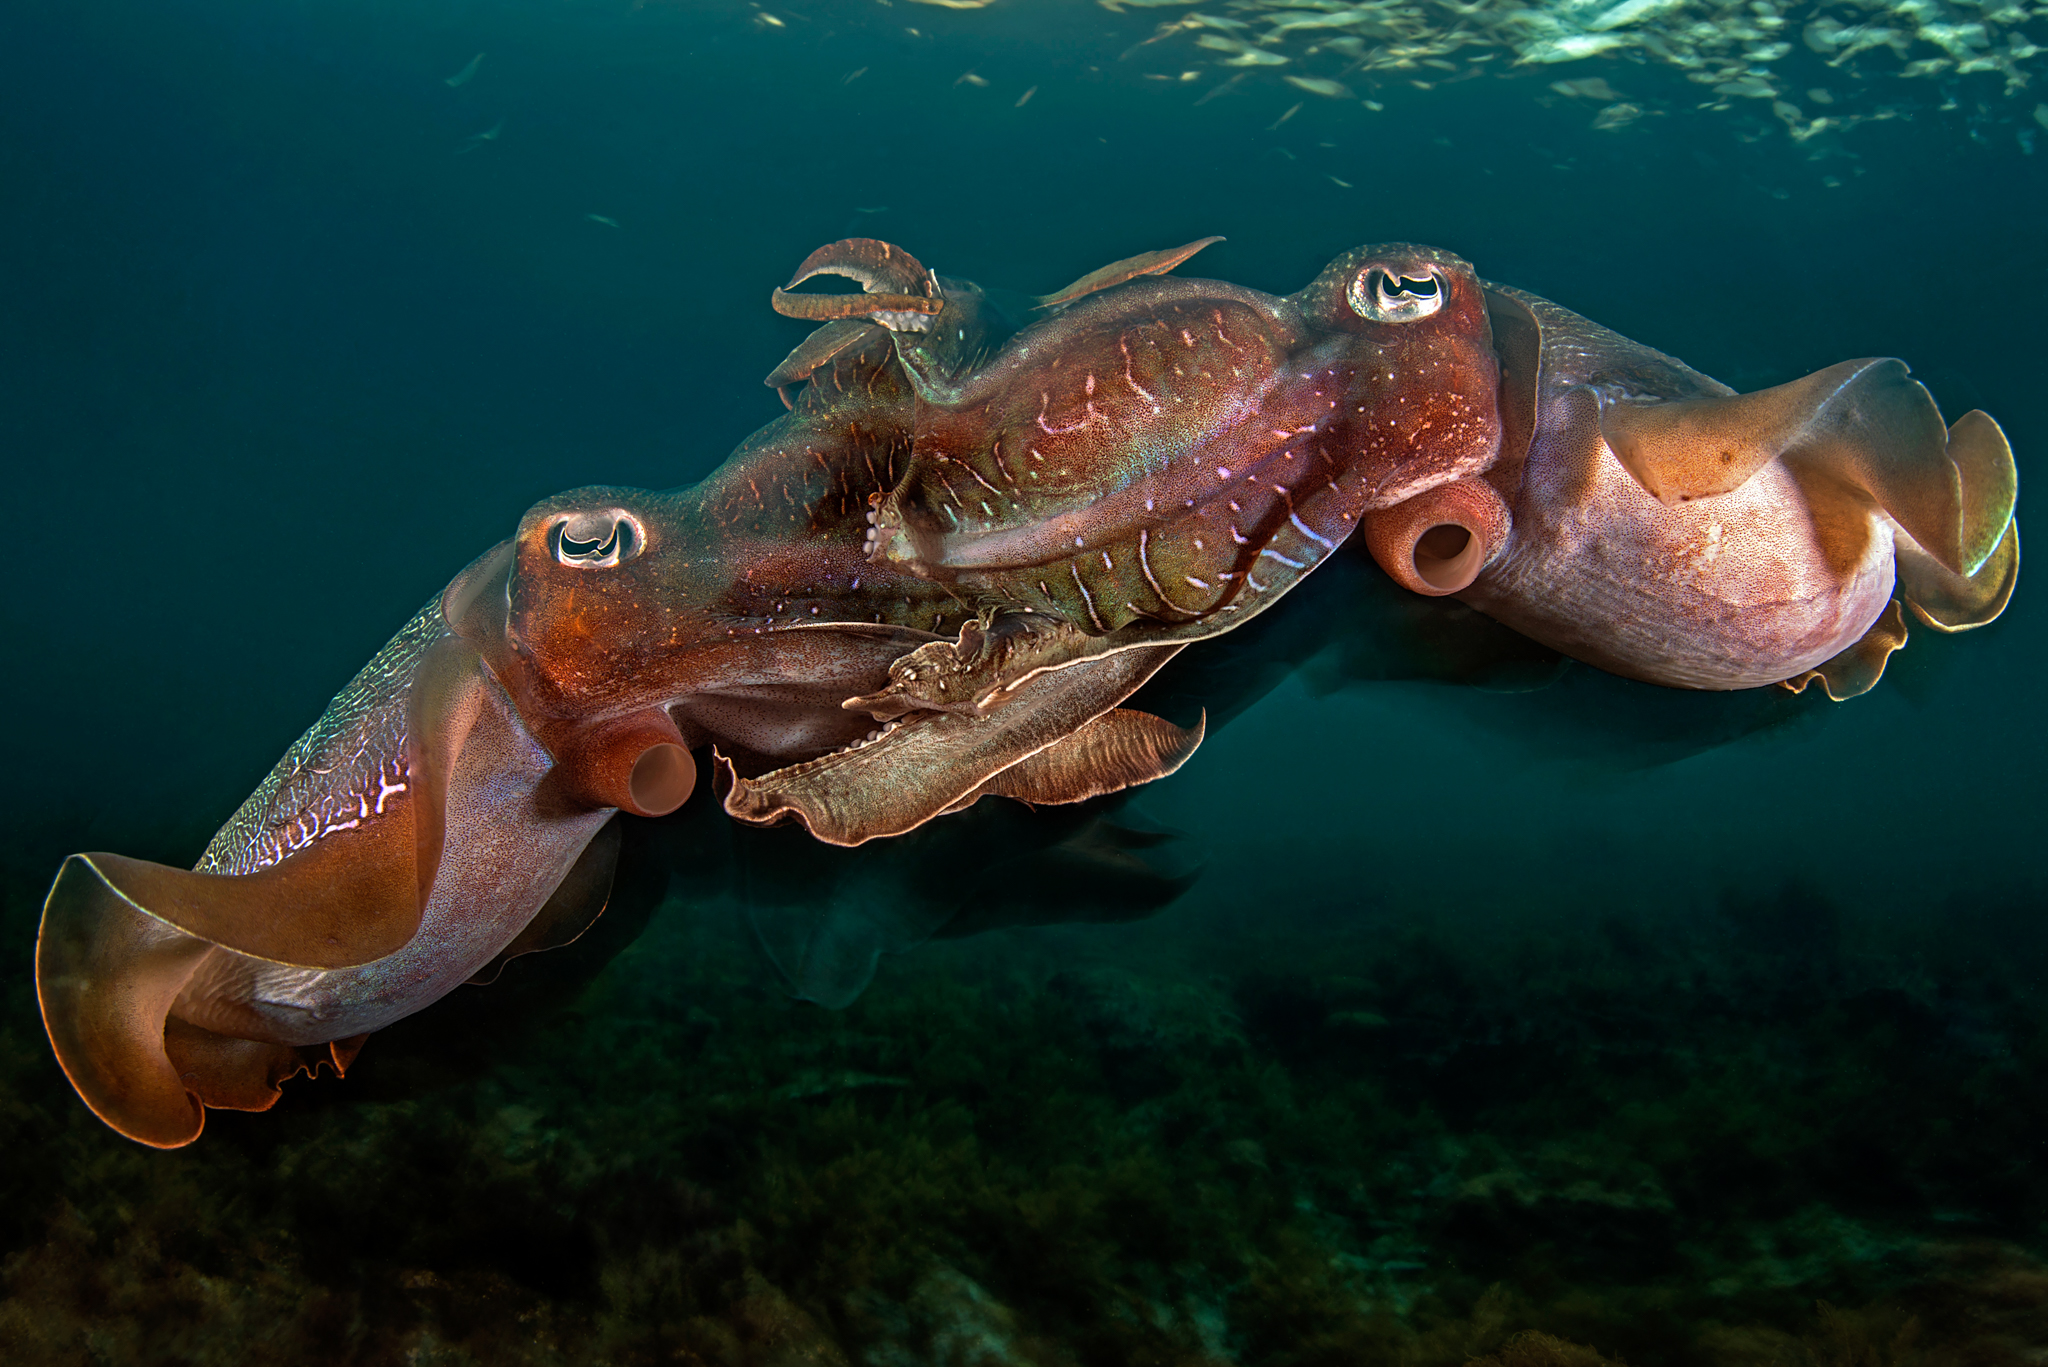 A pair of giant Australian cuttlefish mate at dusk.